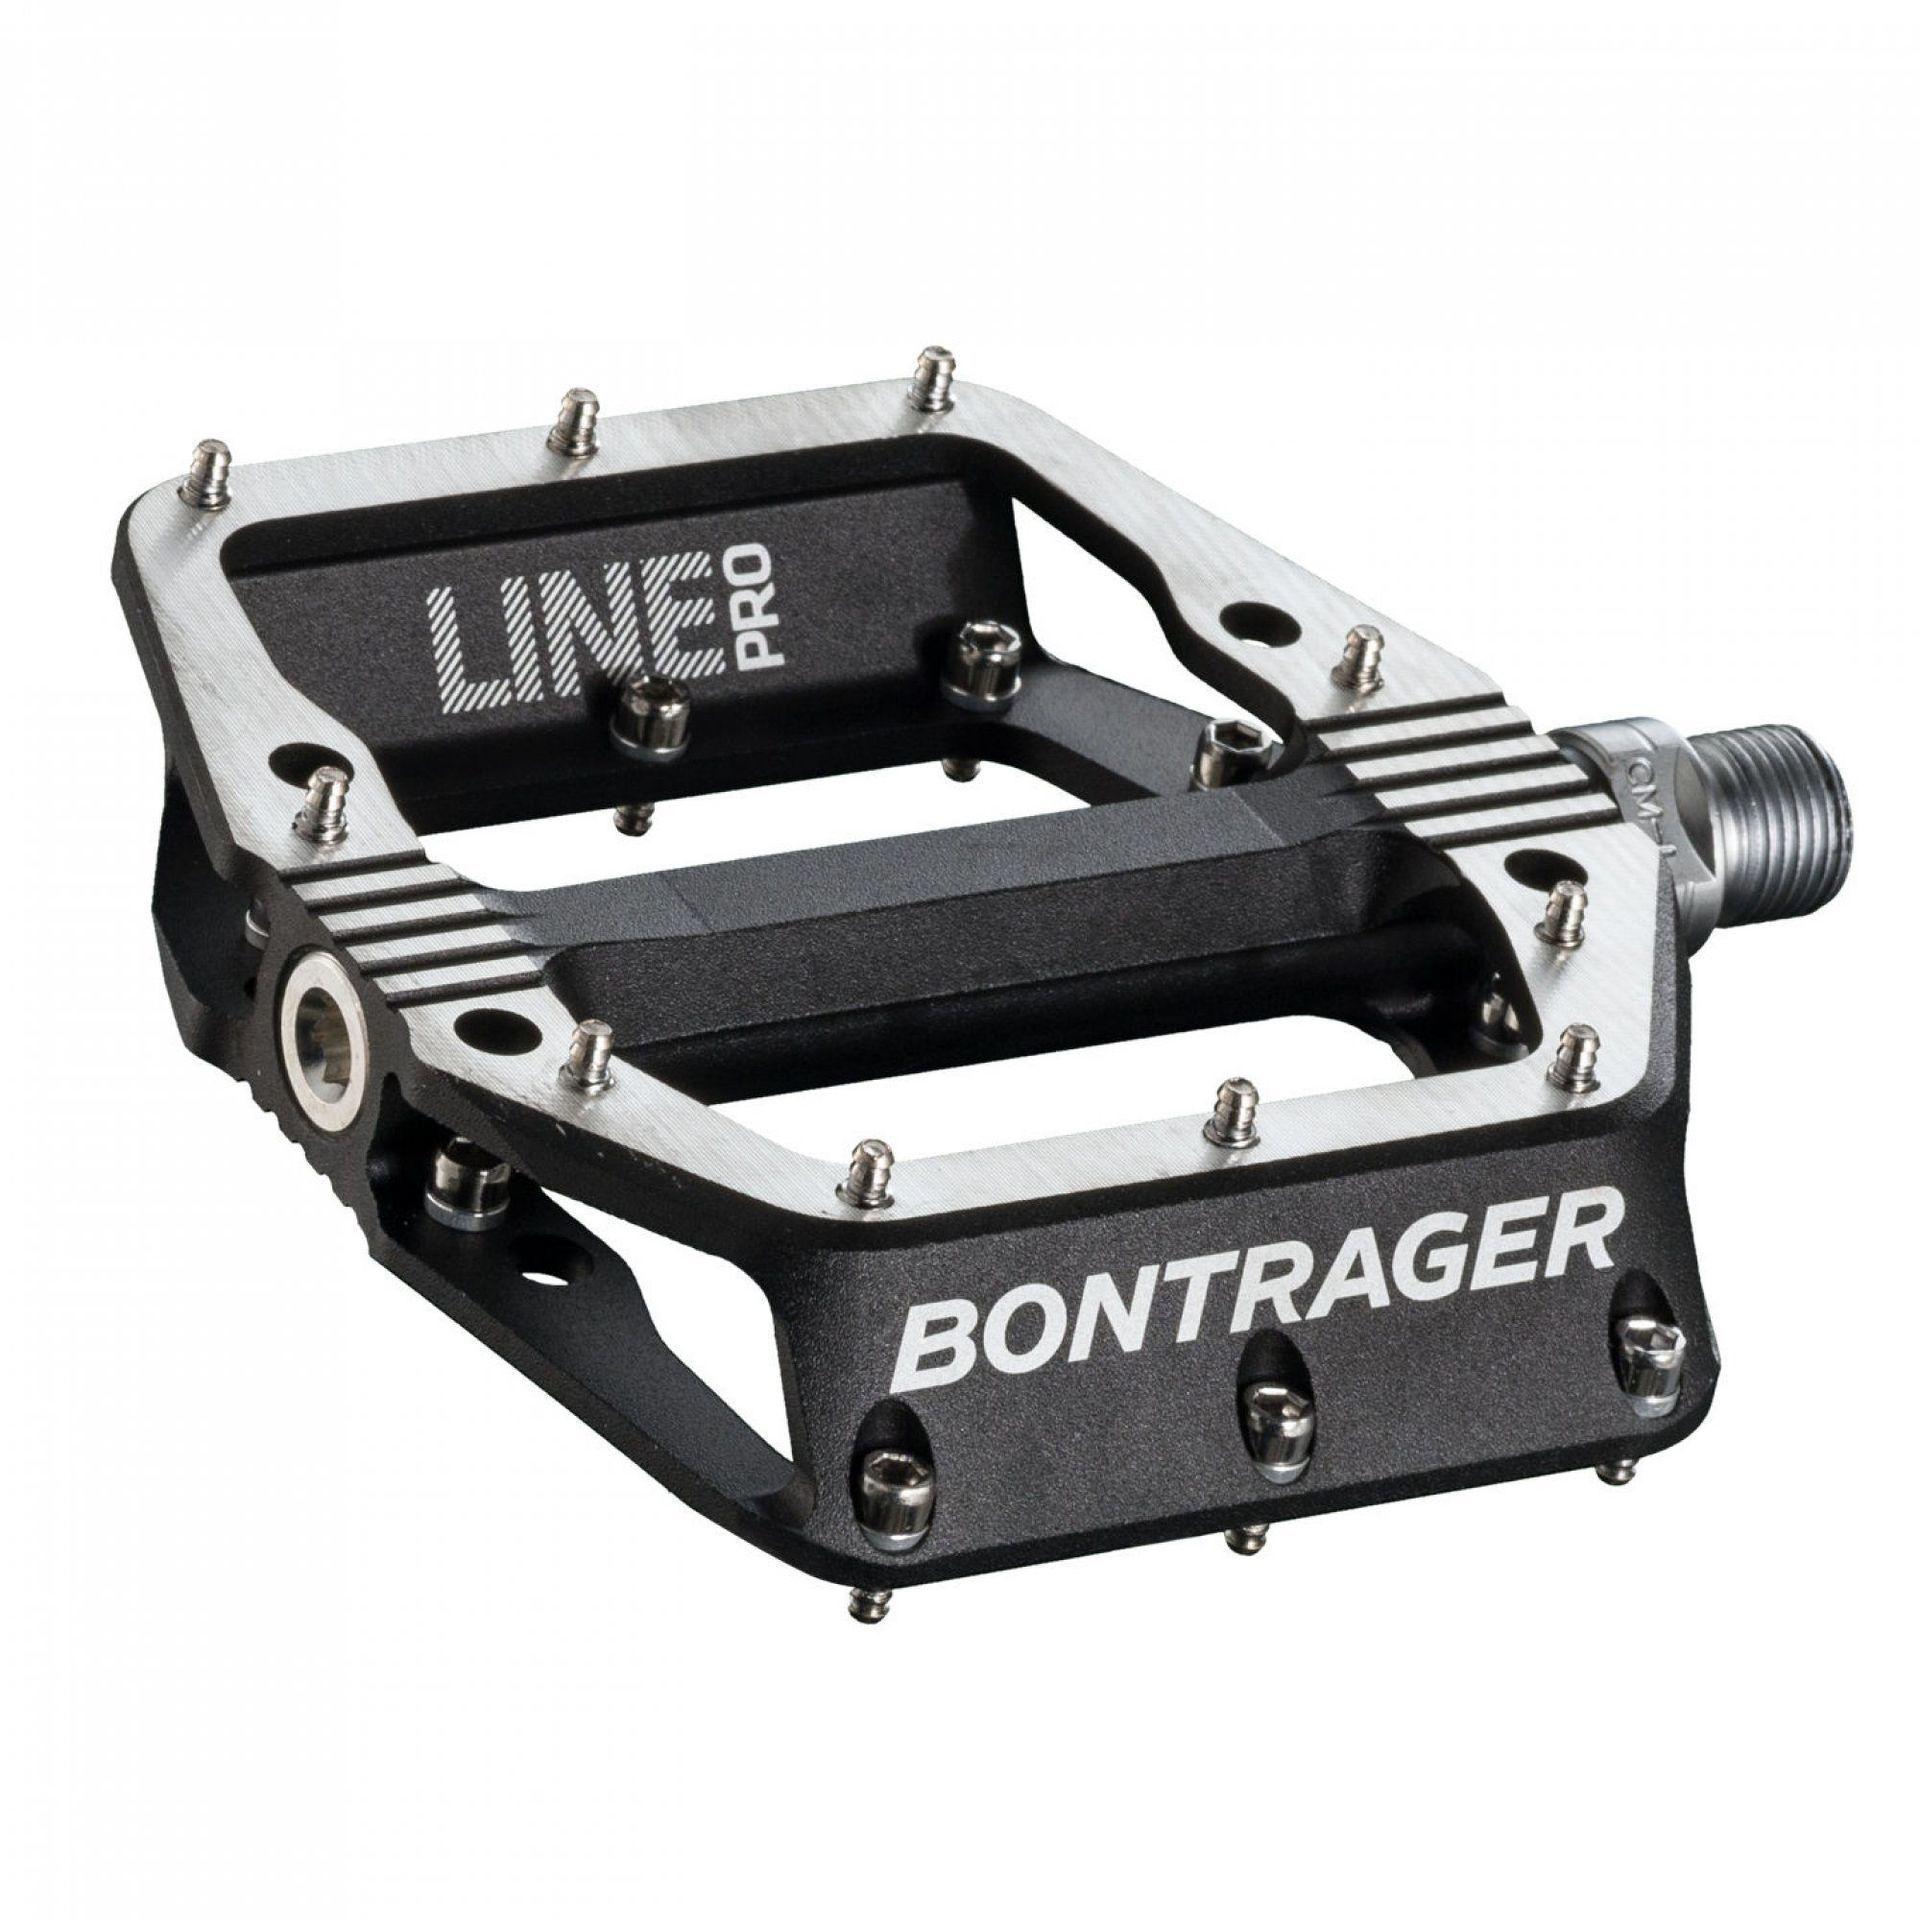 PEDAŁY ROWEROWE BONTRAGER LINE PRO FLAT 524431 1